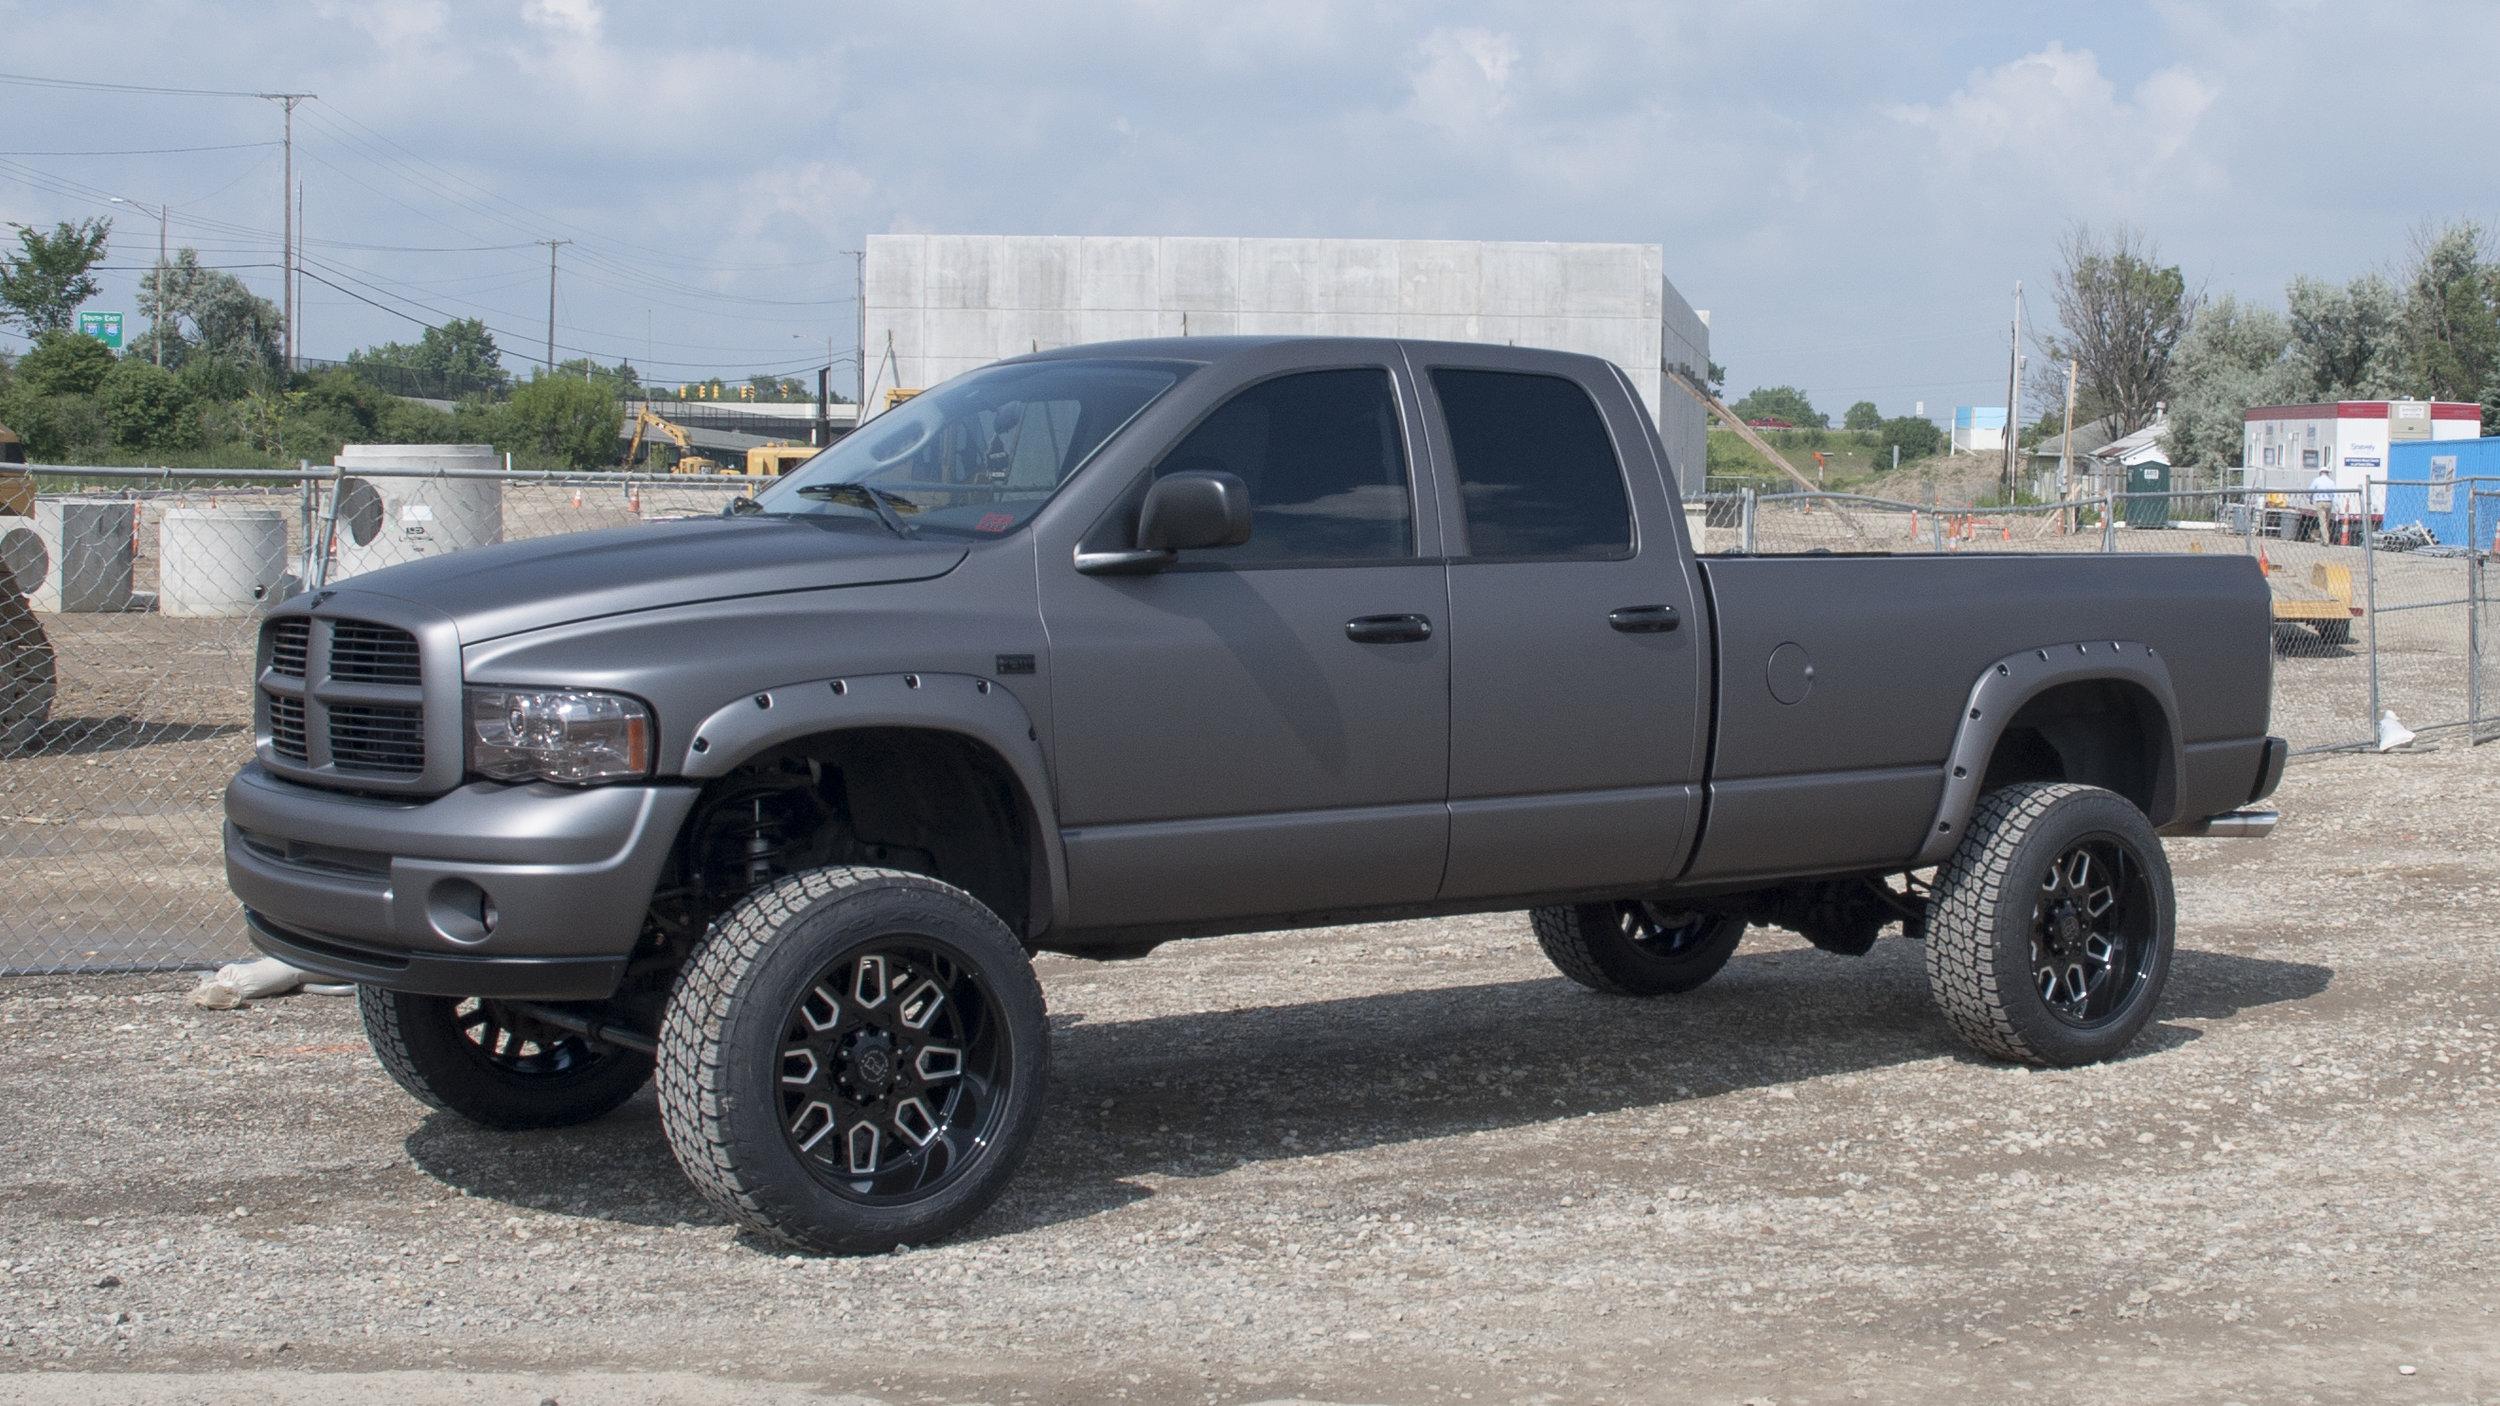 "Lifted Dodge Ram - Charcoal Matte Metallic, 22"" Black Rhino Wheels, 6"" Lift, Ceramic Tint"